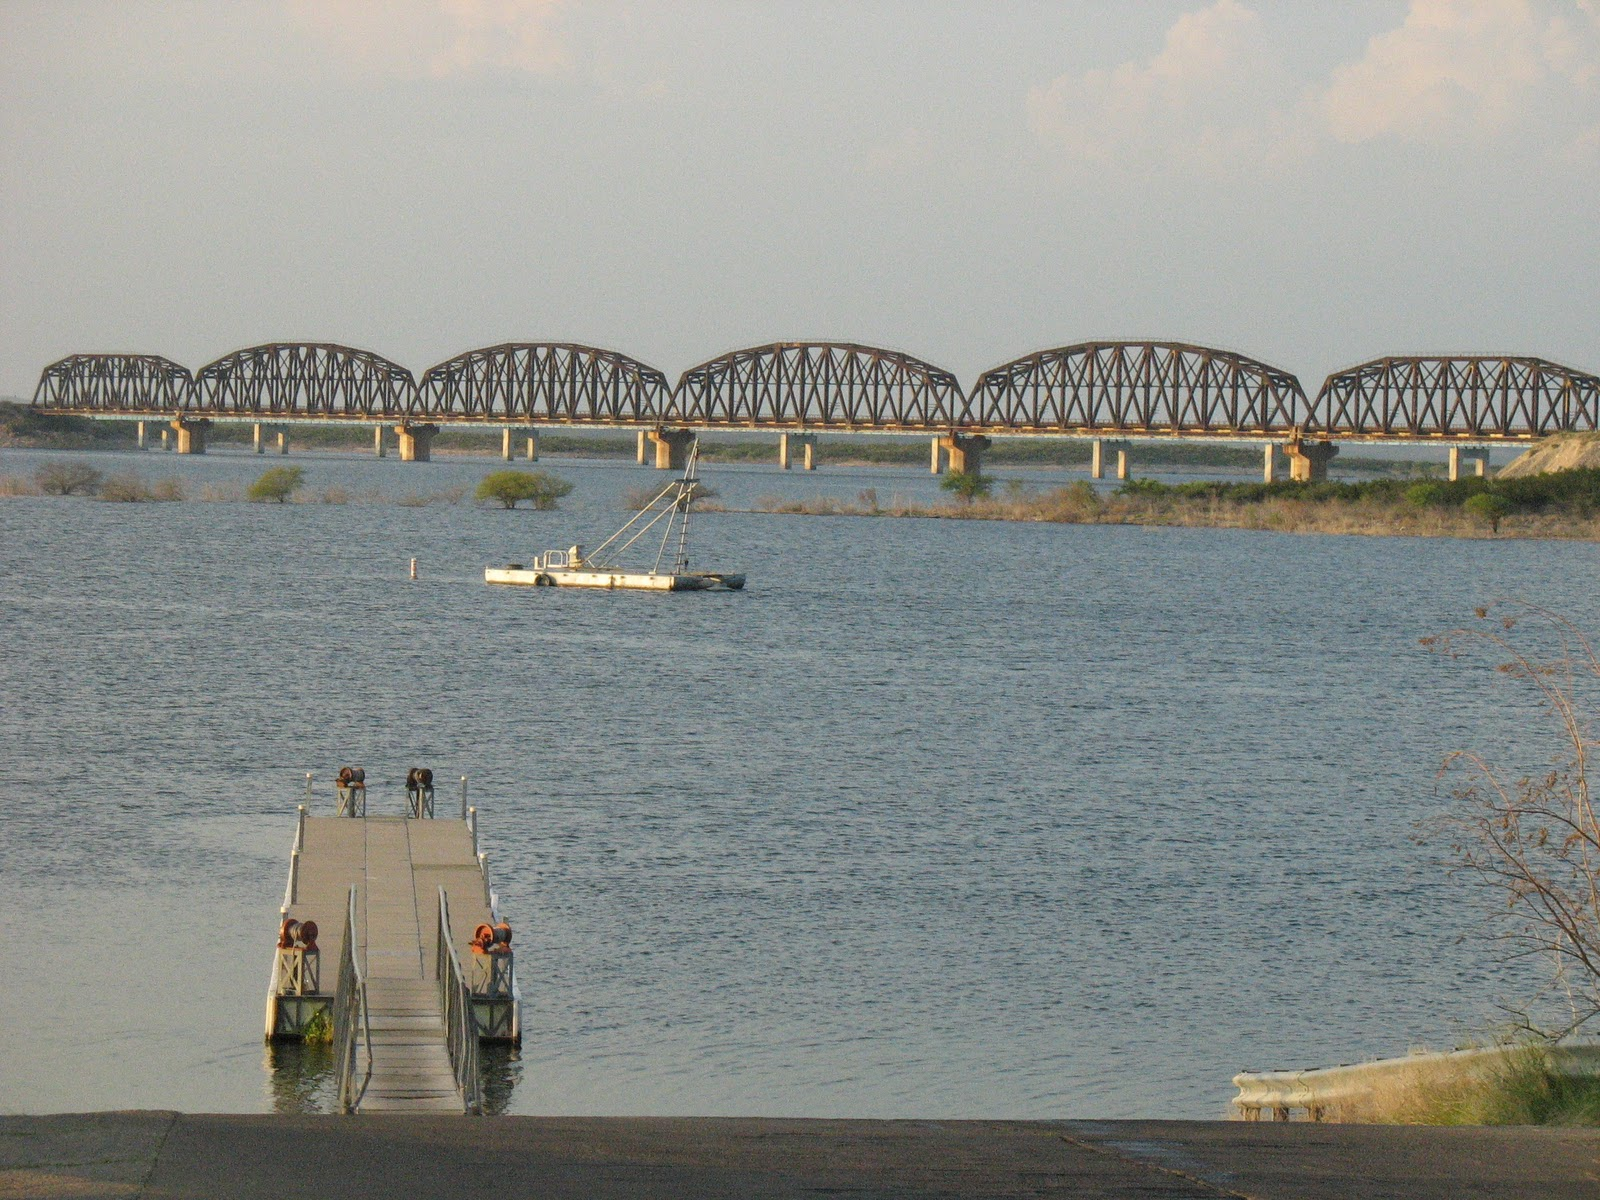 Listo del rio andale lake amistad for Lake amistad fishing